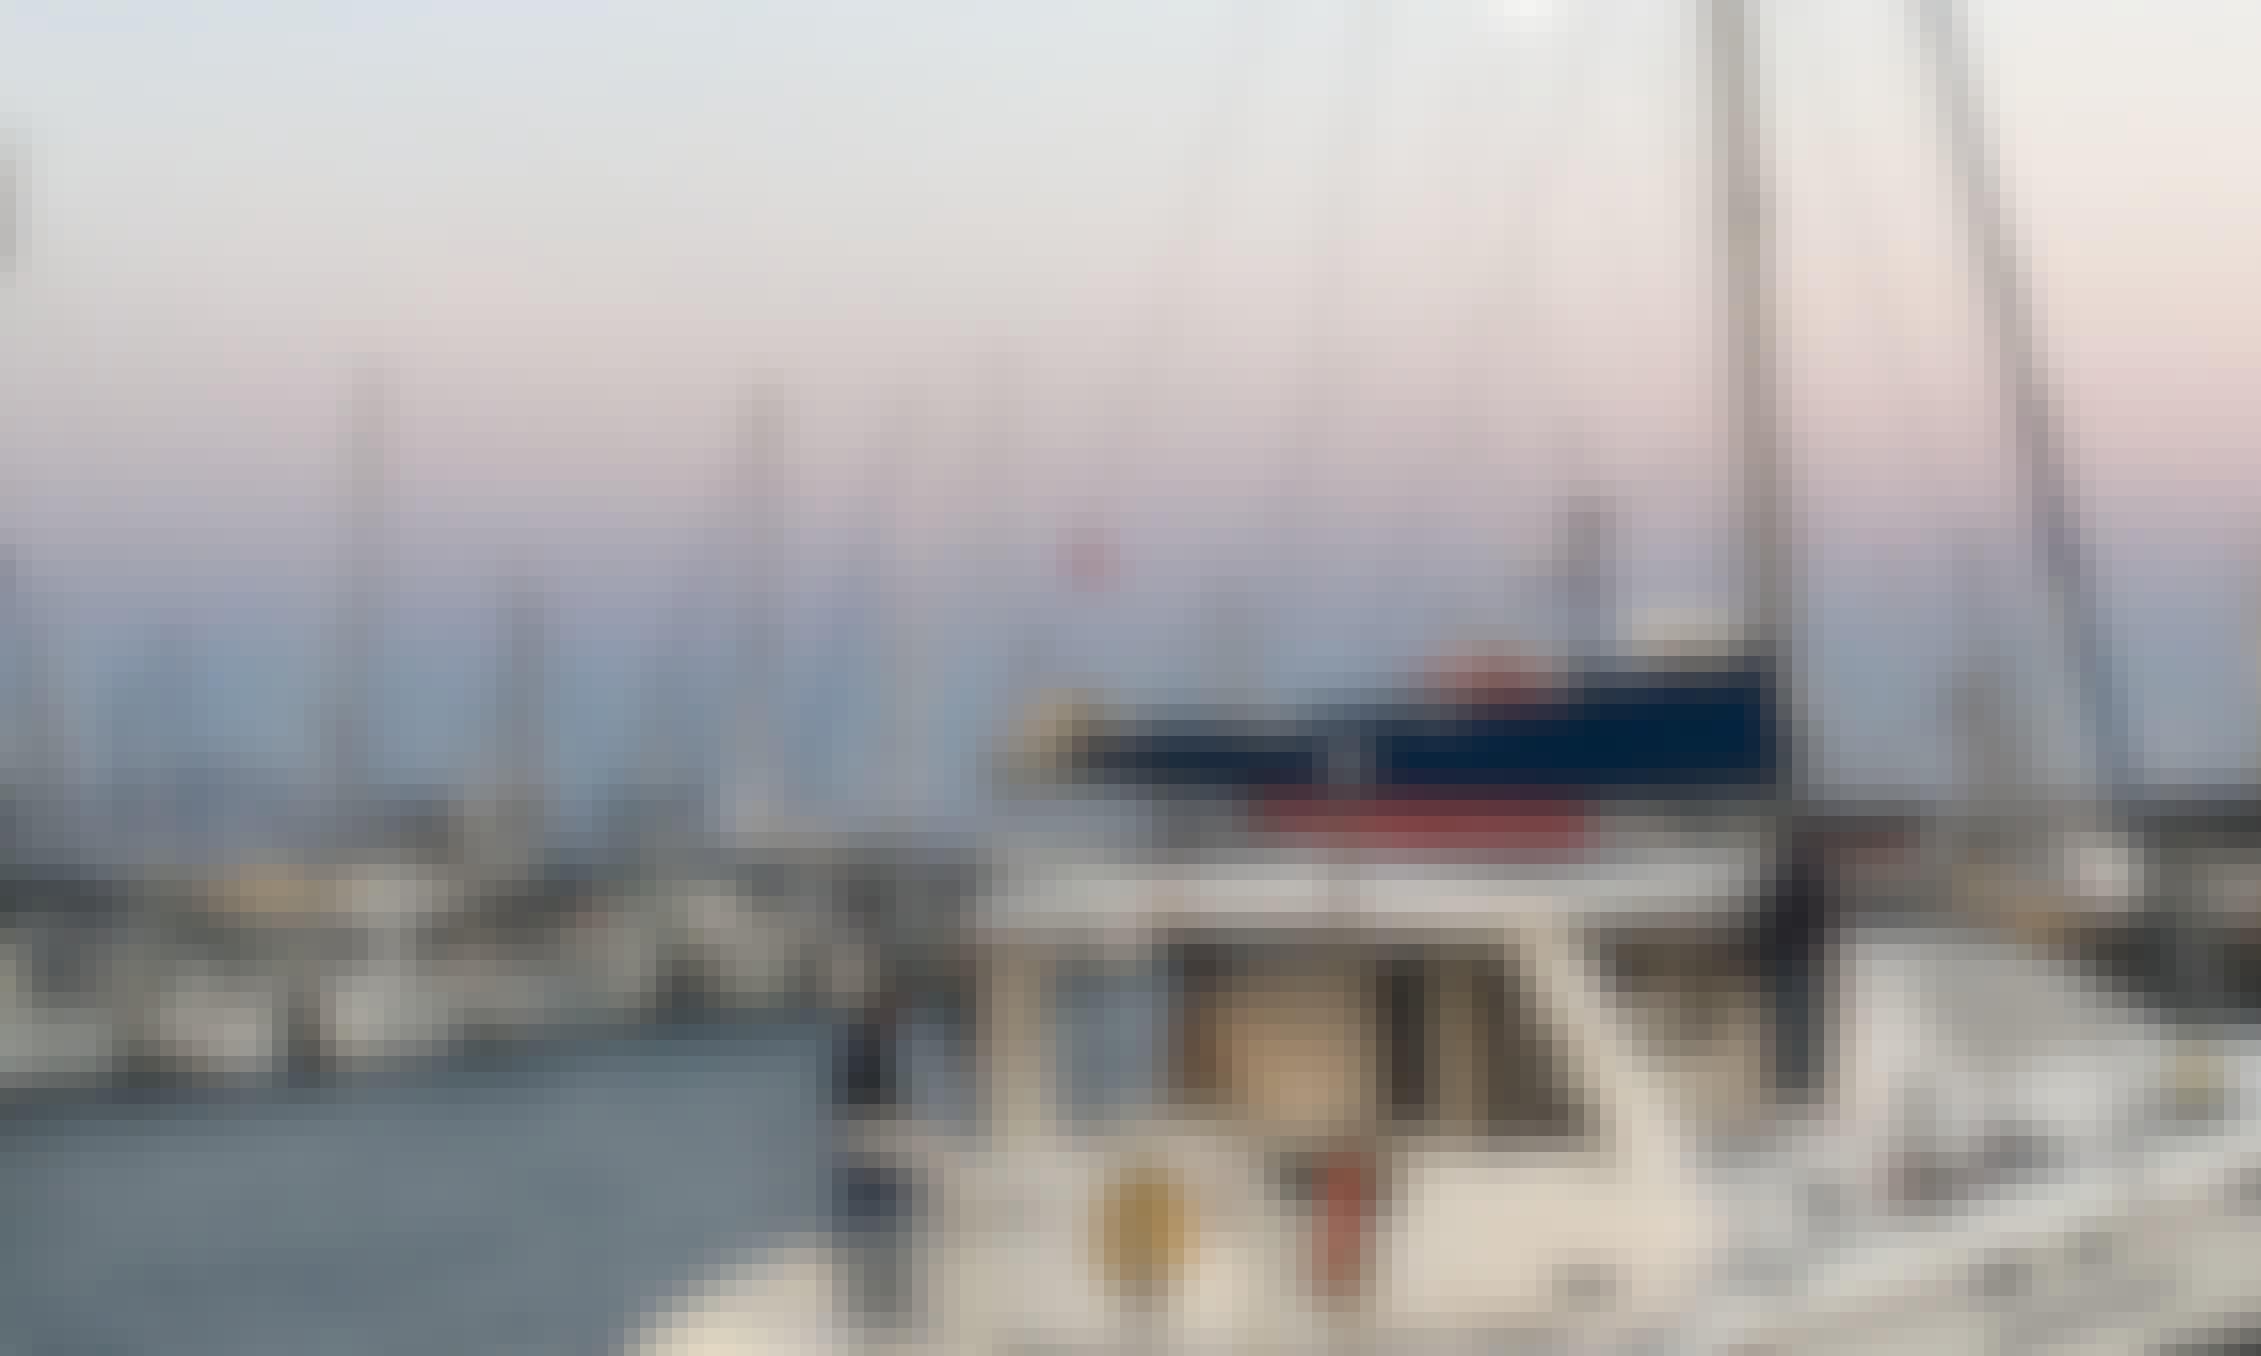 Explore the Ventura coast in style with this 43' Leopard sailing catamaran!